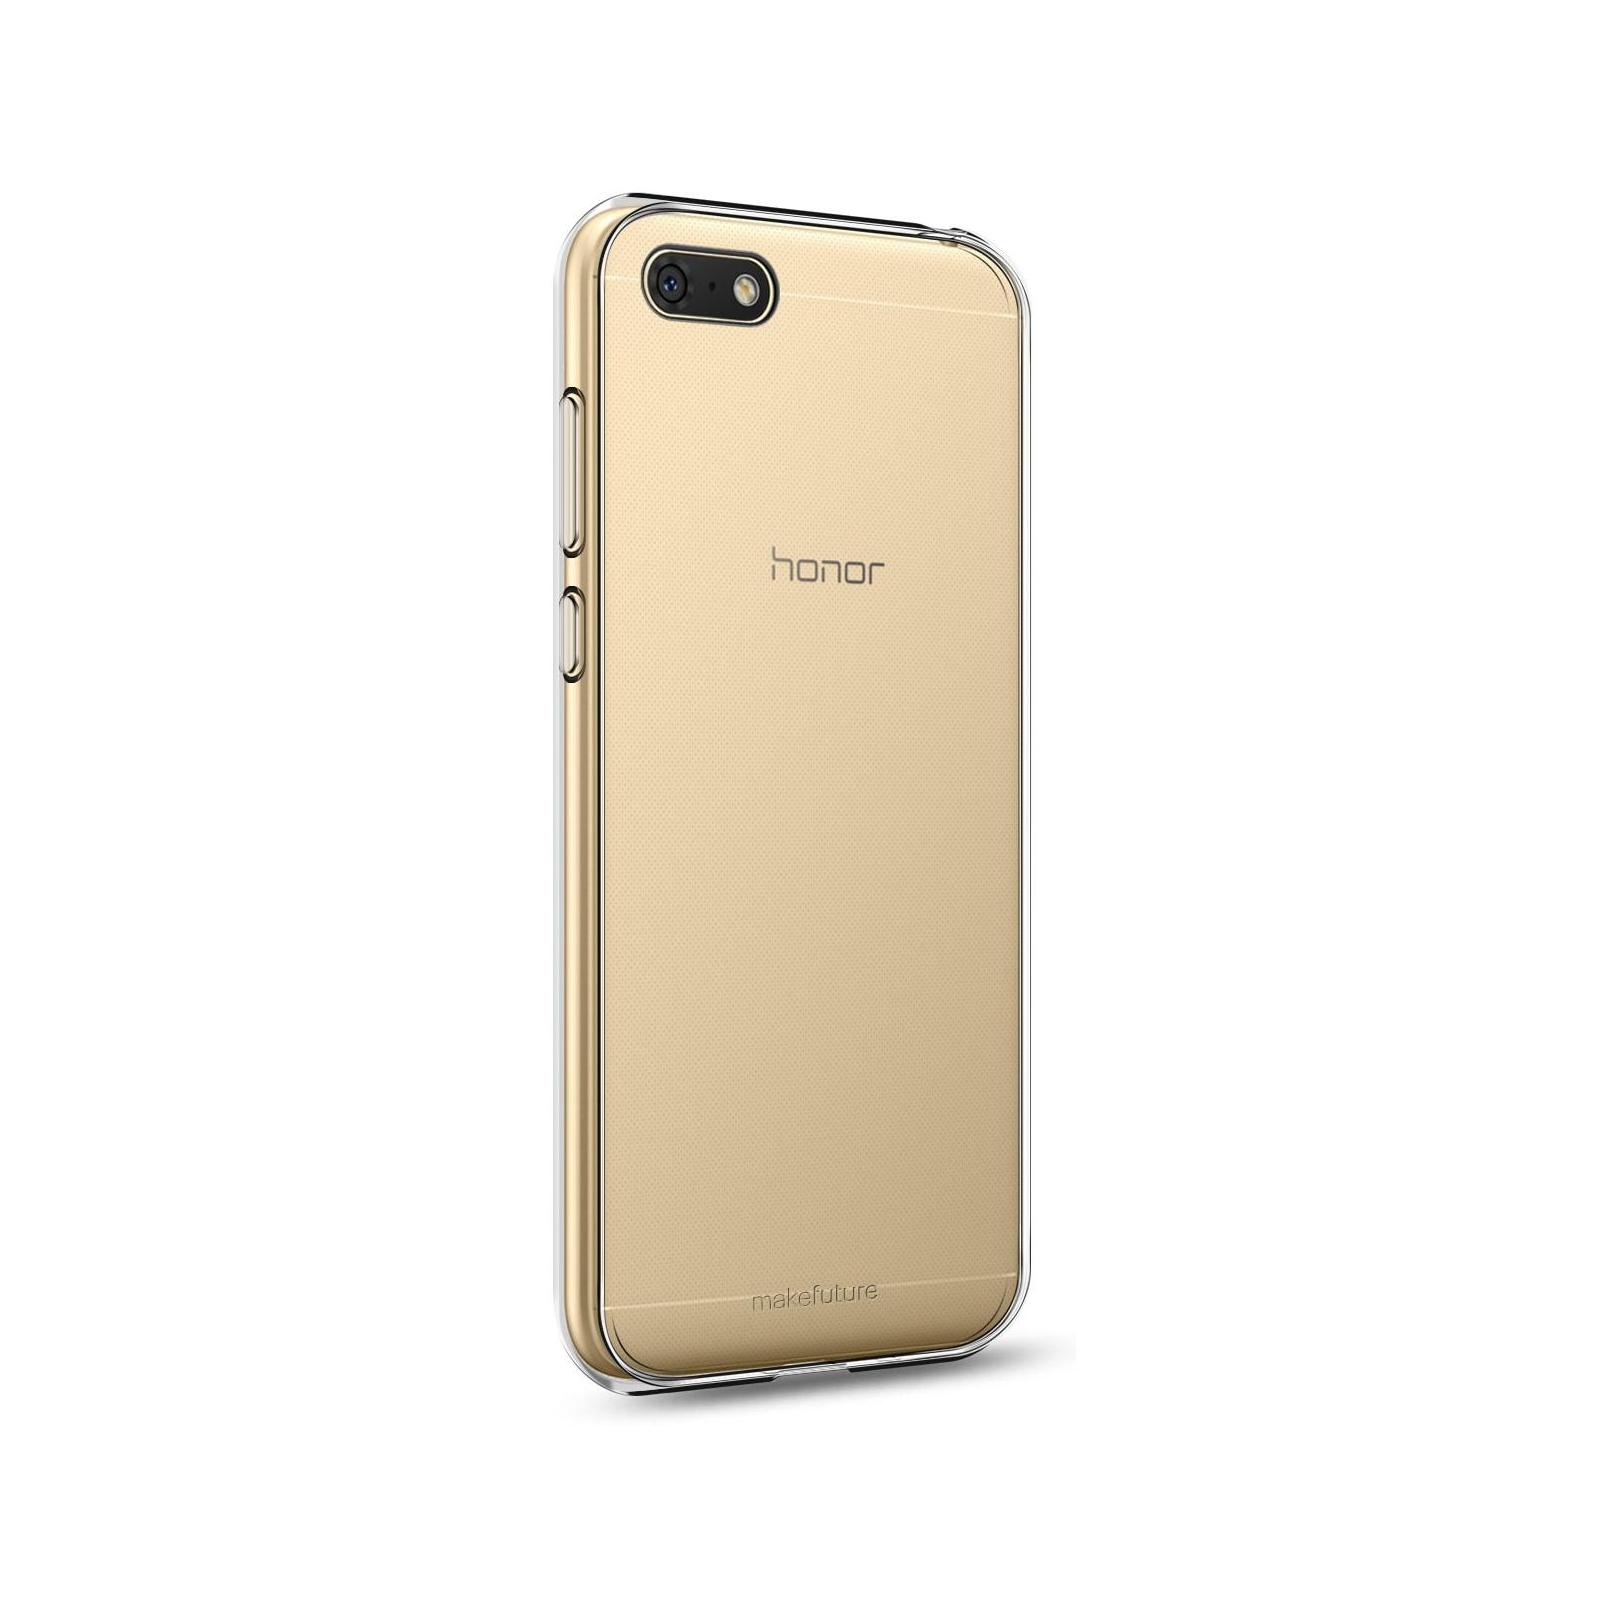 Чехол для моб. телефона MakeFuture Air Case (TPU) Honor 7A Clear (MCA-H7AСL / MCA-H7A) изображение 2